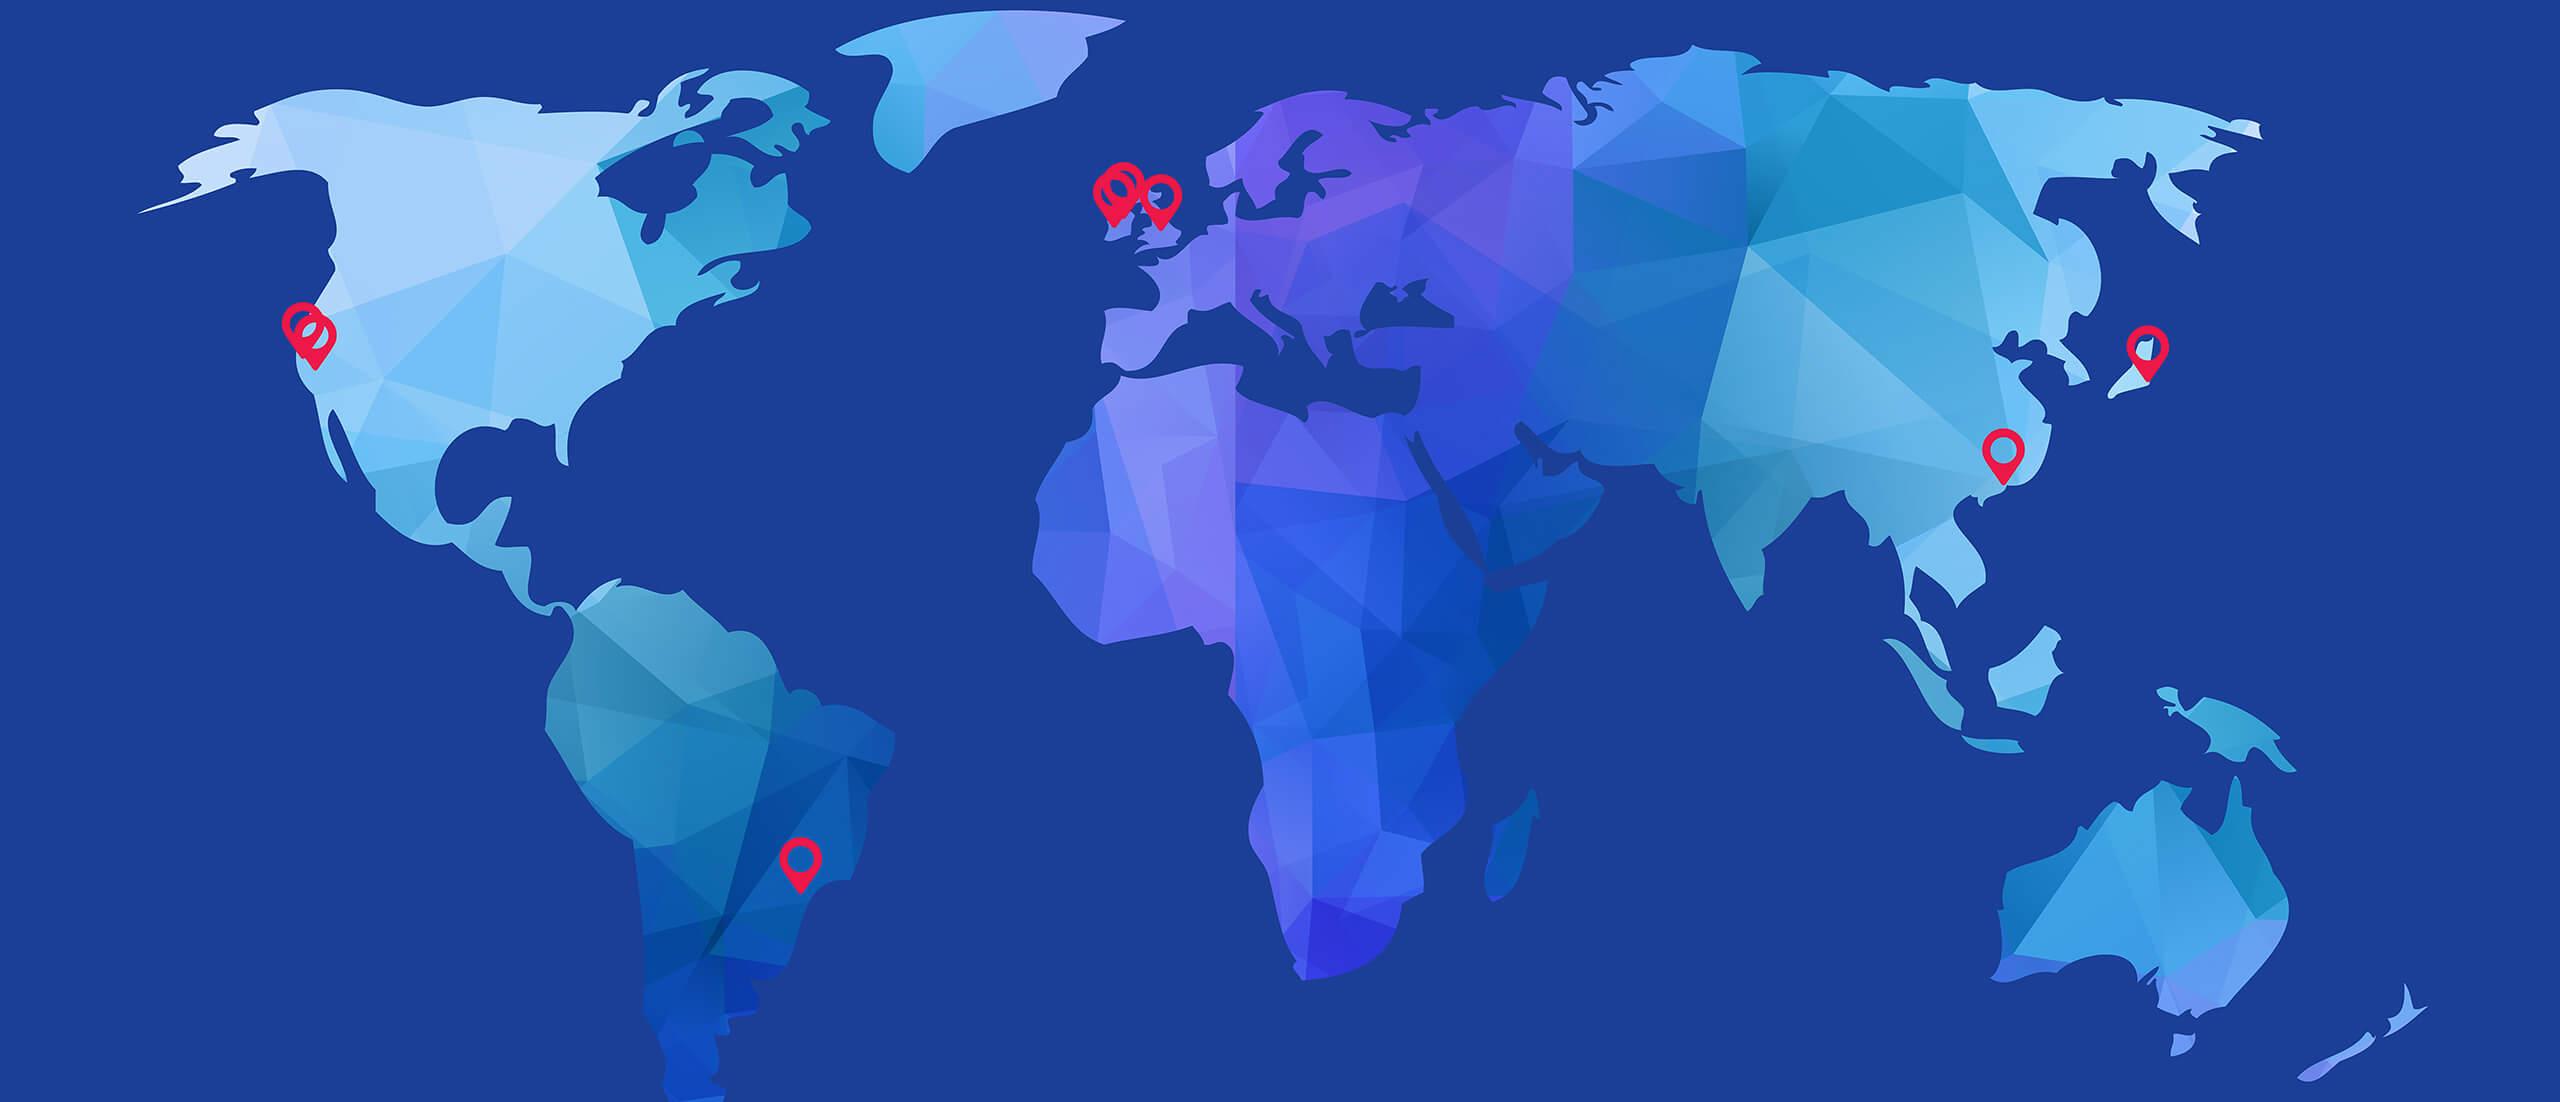 Biomarin world location map